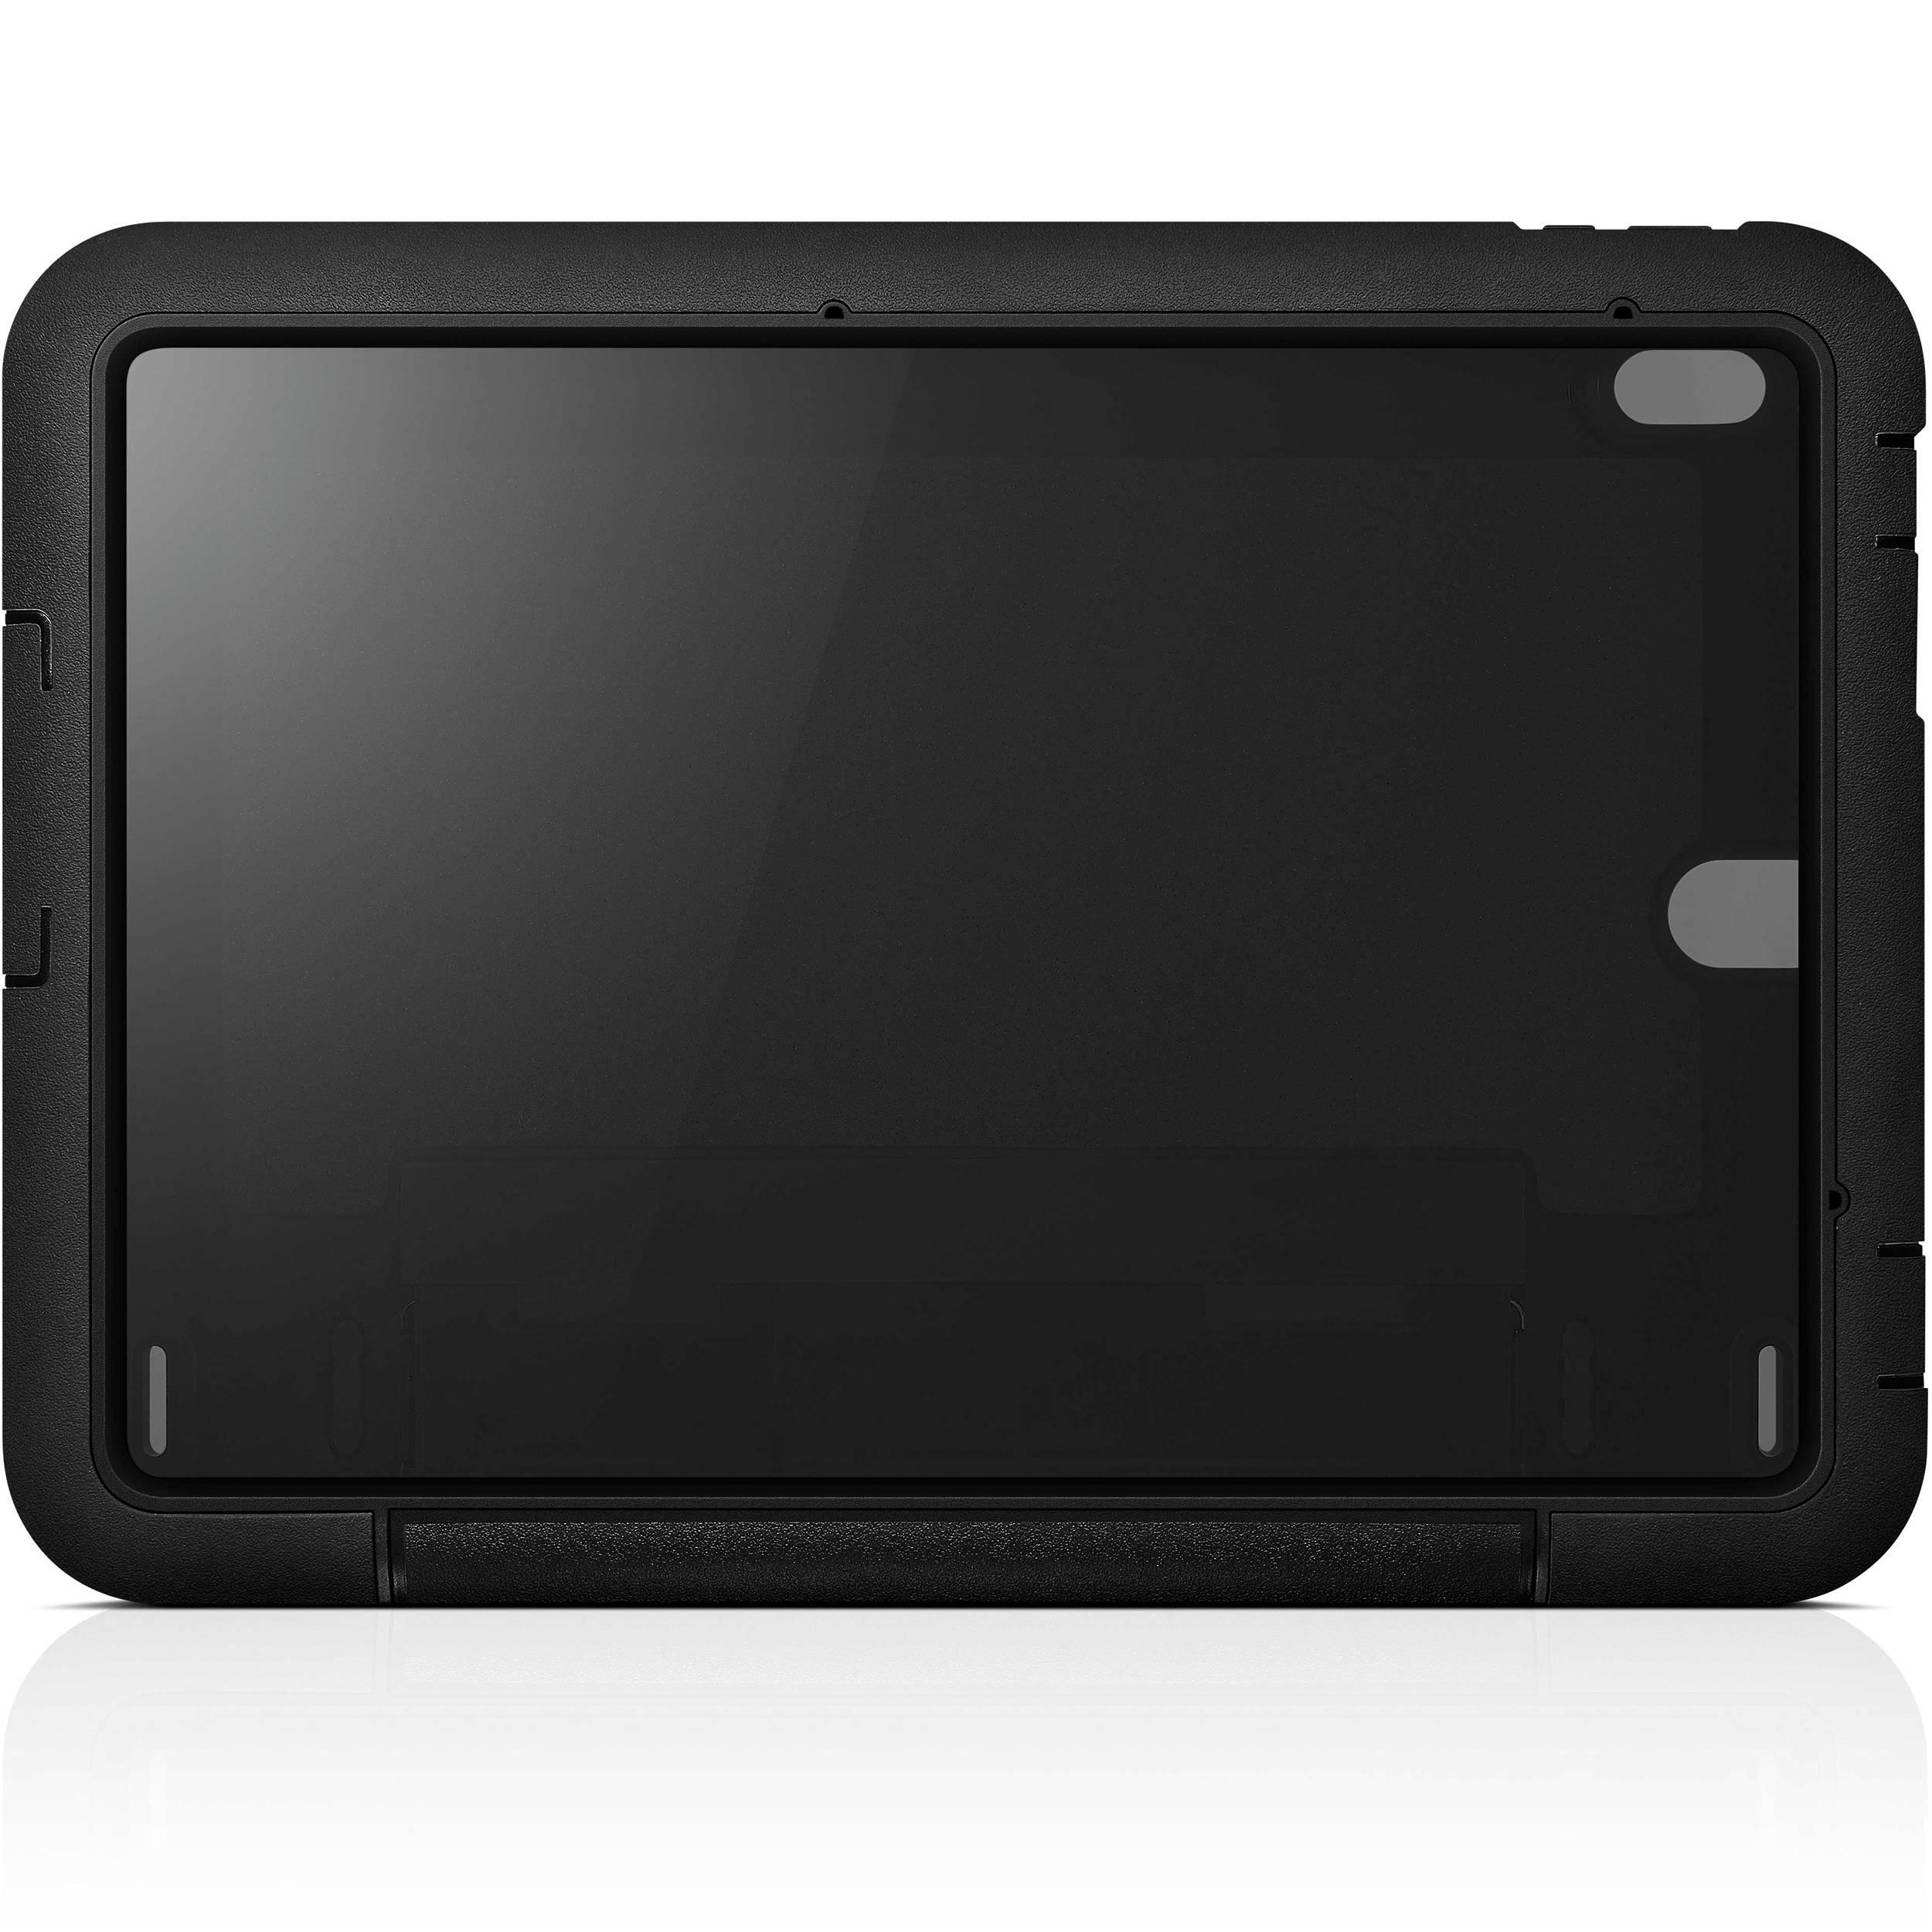 Lenovo ThinkPad Helix Protector Case (Black)